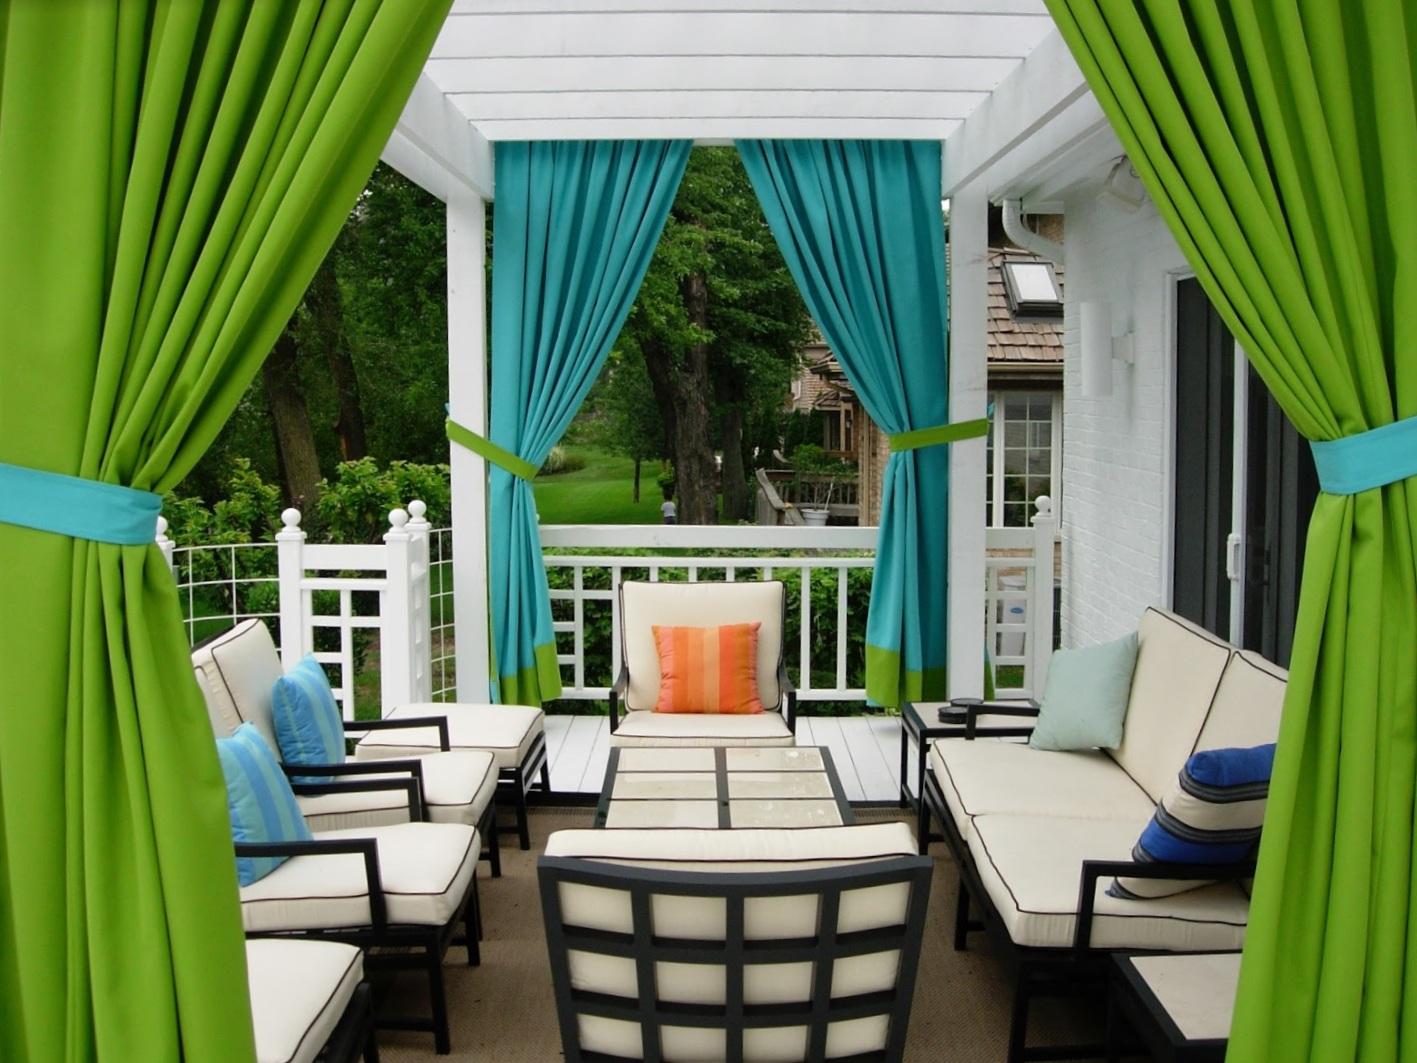 gardens_seating.png